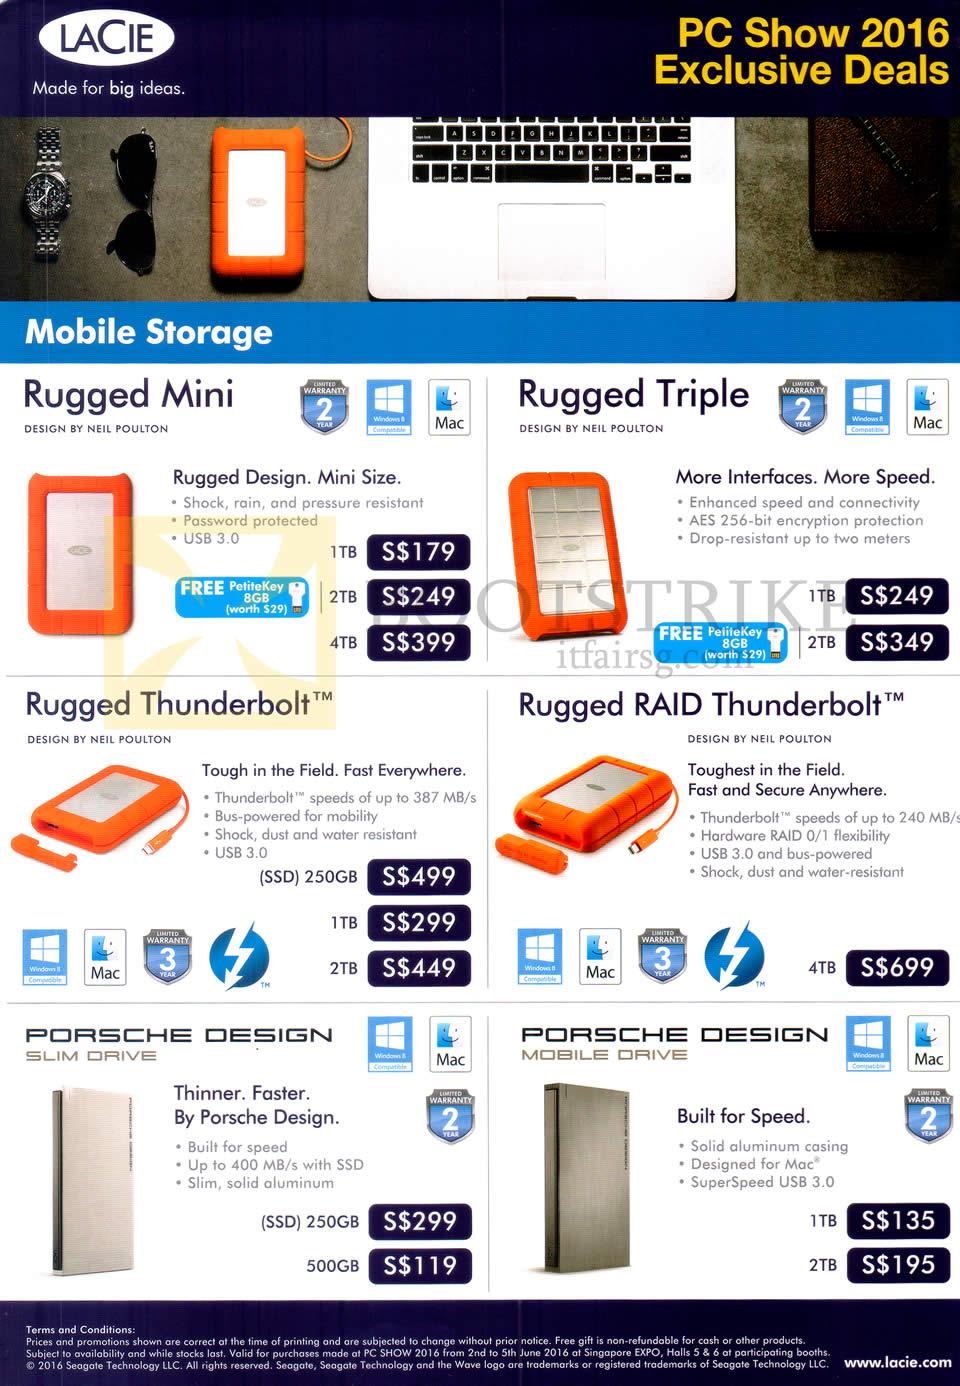 PC SHOW 2016 price list image brochure of Seagate Lacie Mobile Storage Rugged Mini, Triple, Thunderbolt, RAID Thunderbolt, Porsche Design Slim, Mobile Drive